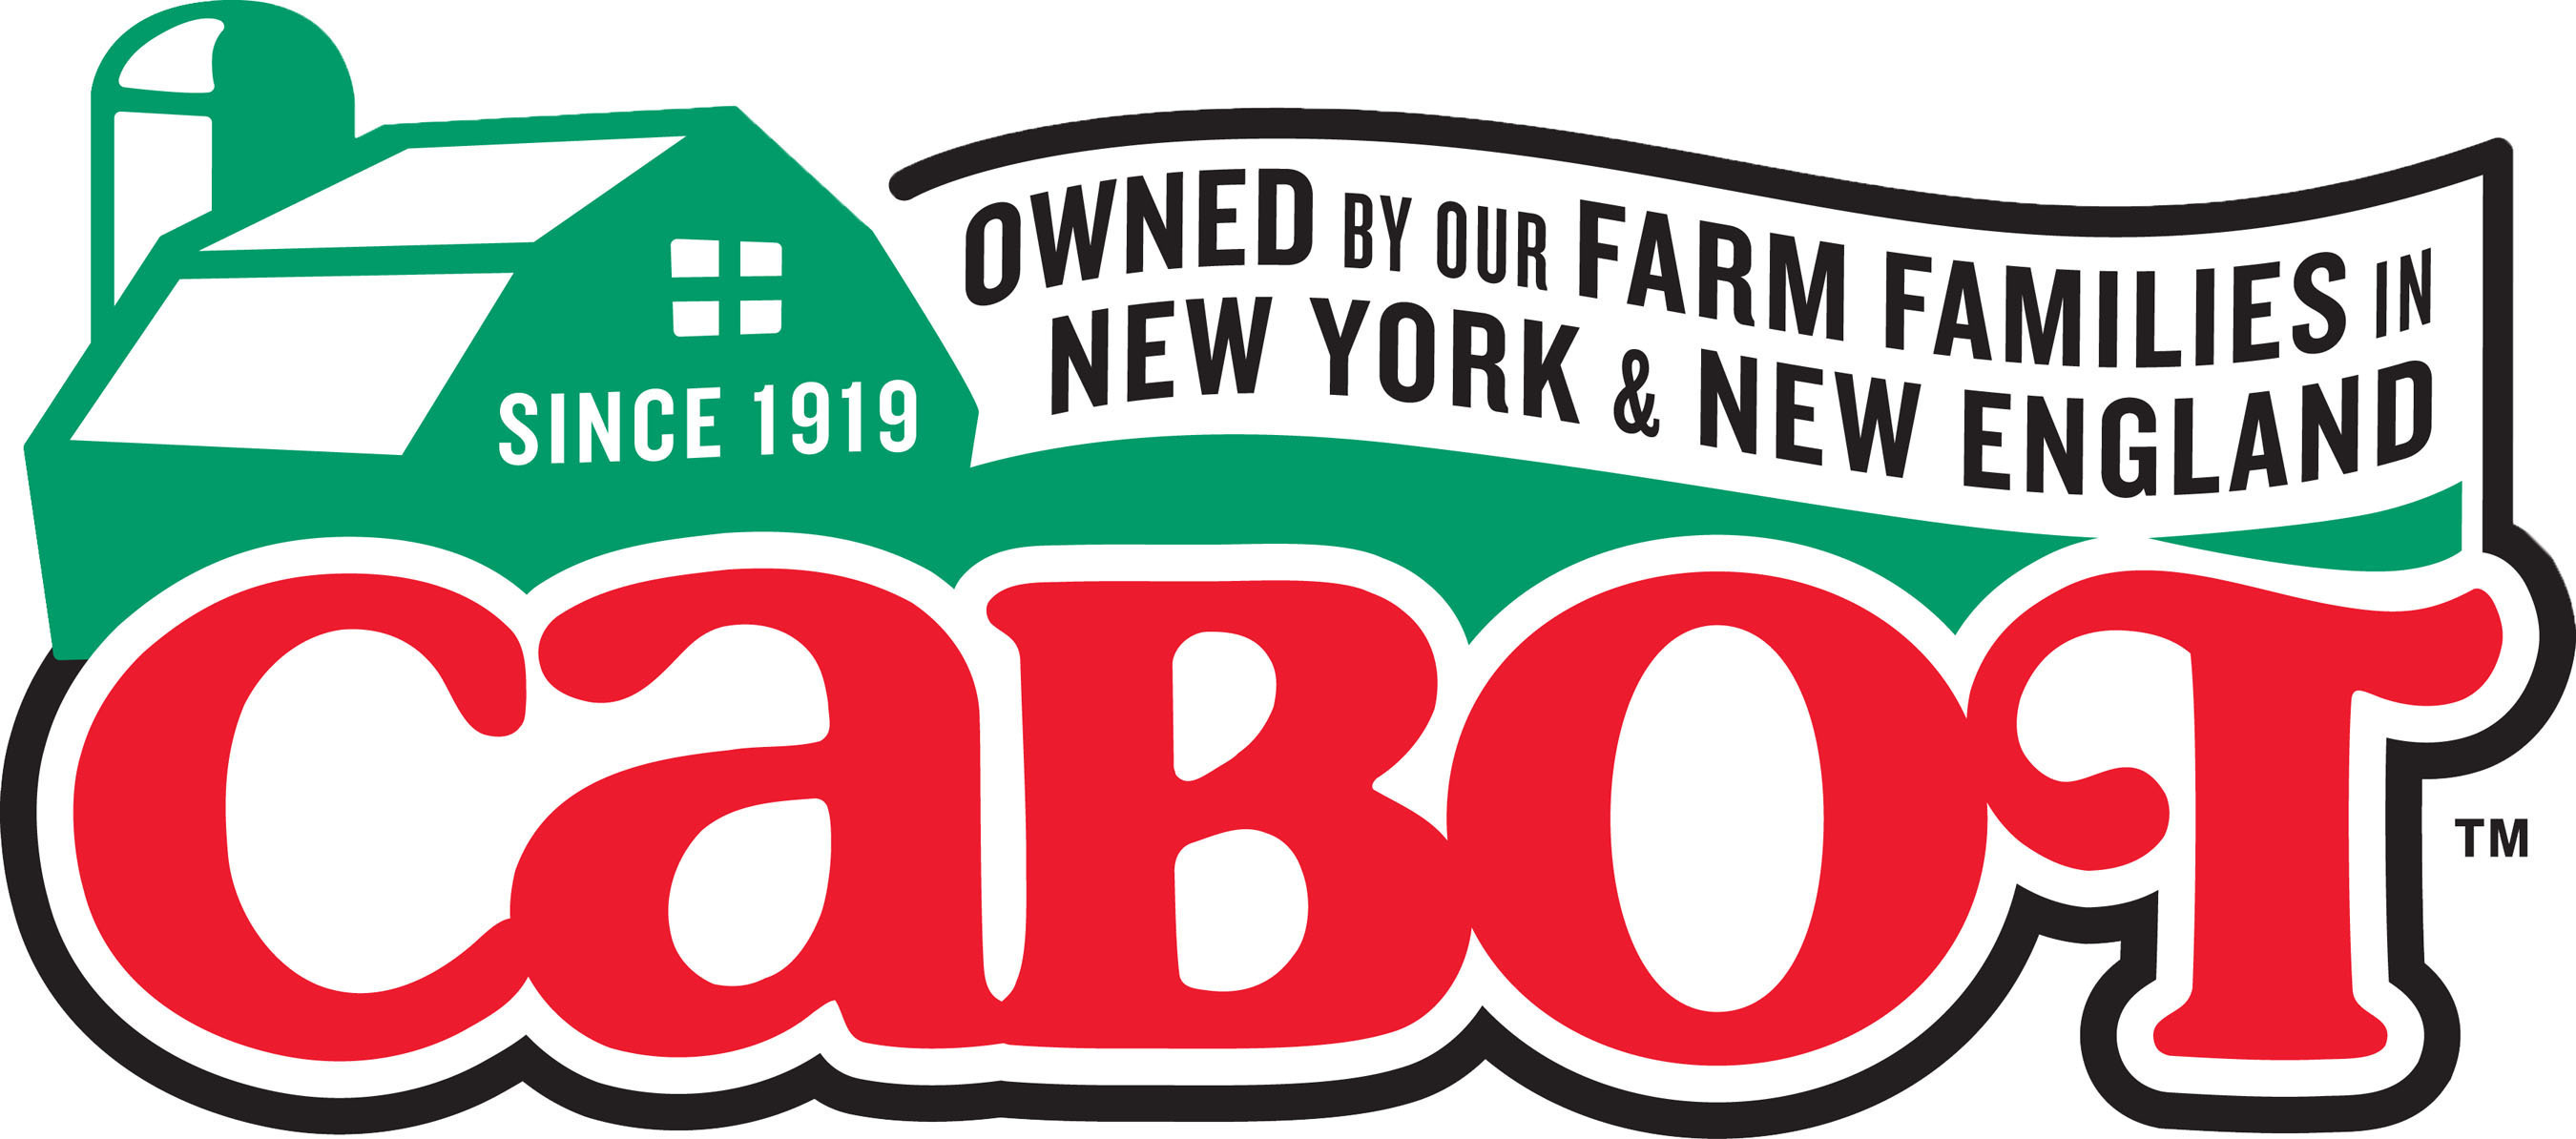 Cabot Creamery Cooperative logo. (PRNewsFoto/Cabot Creamery Cooperative) (PRNewsFoto/)